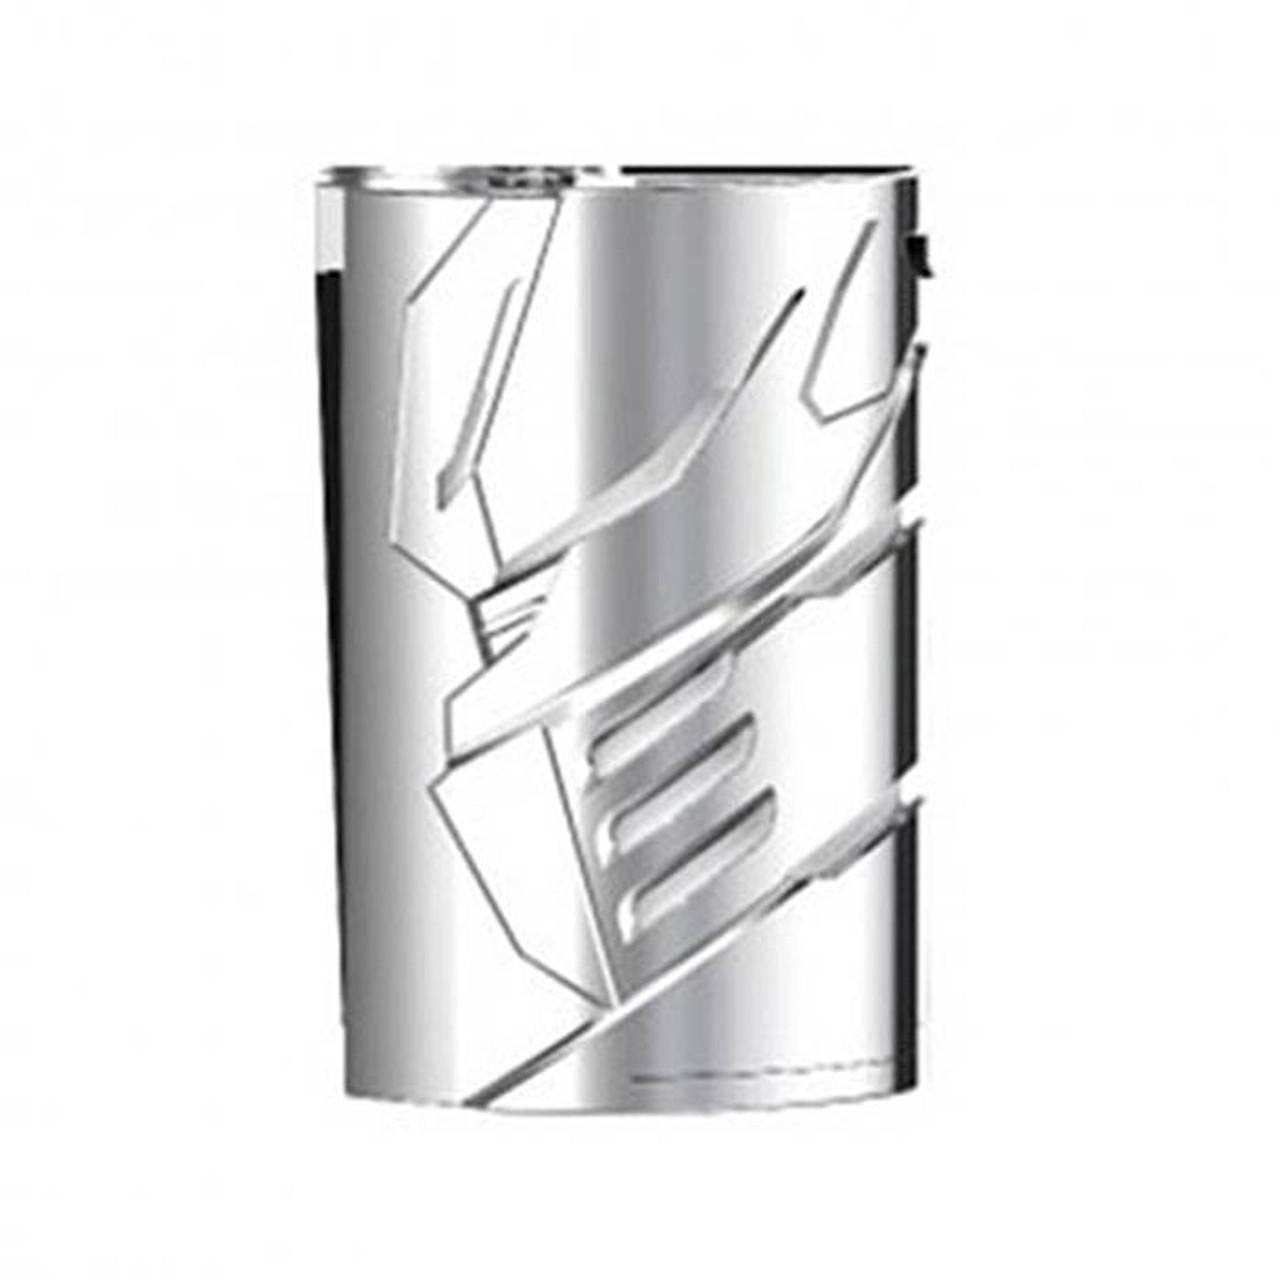 SMOK T-Priv 3 300W TC Box Mod